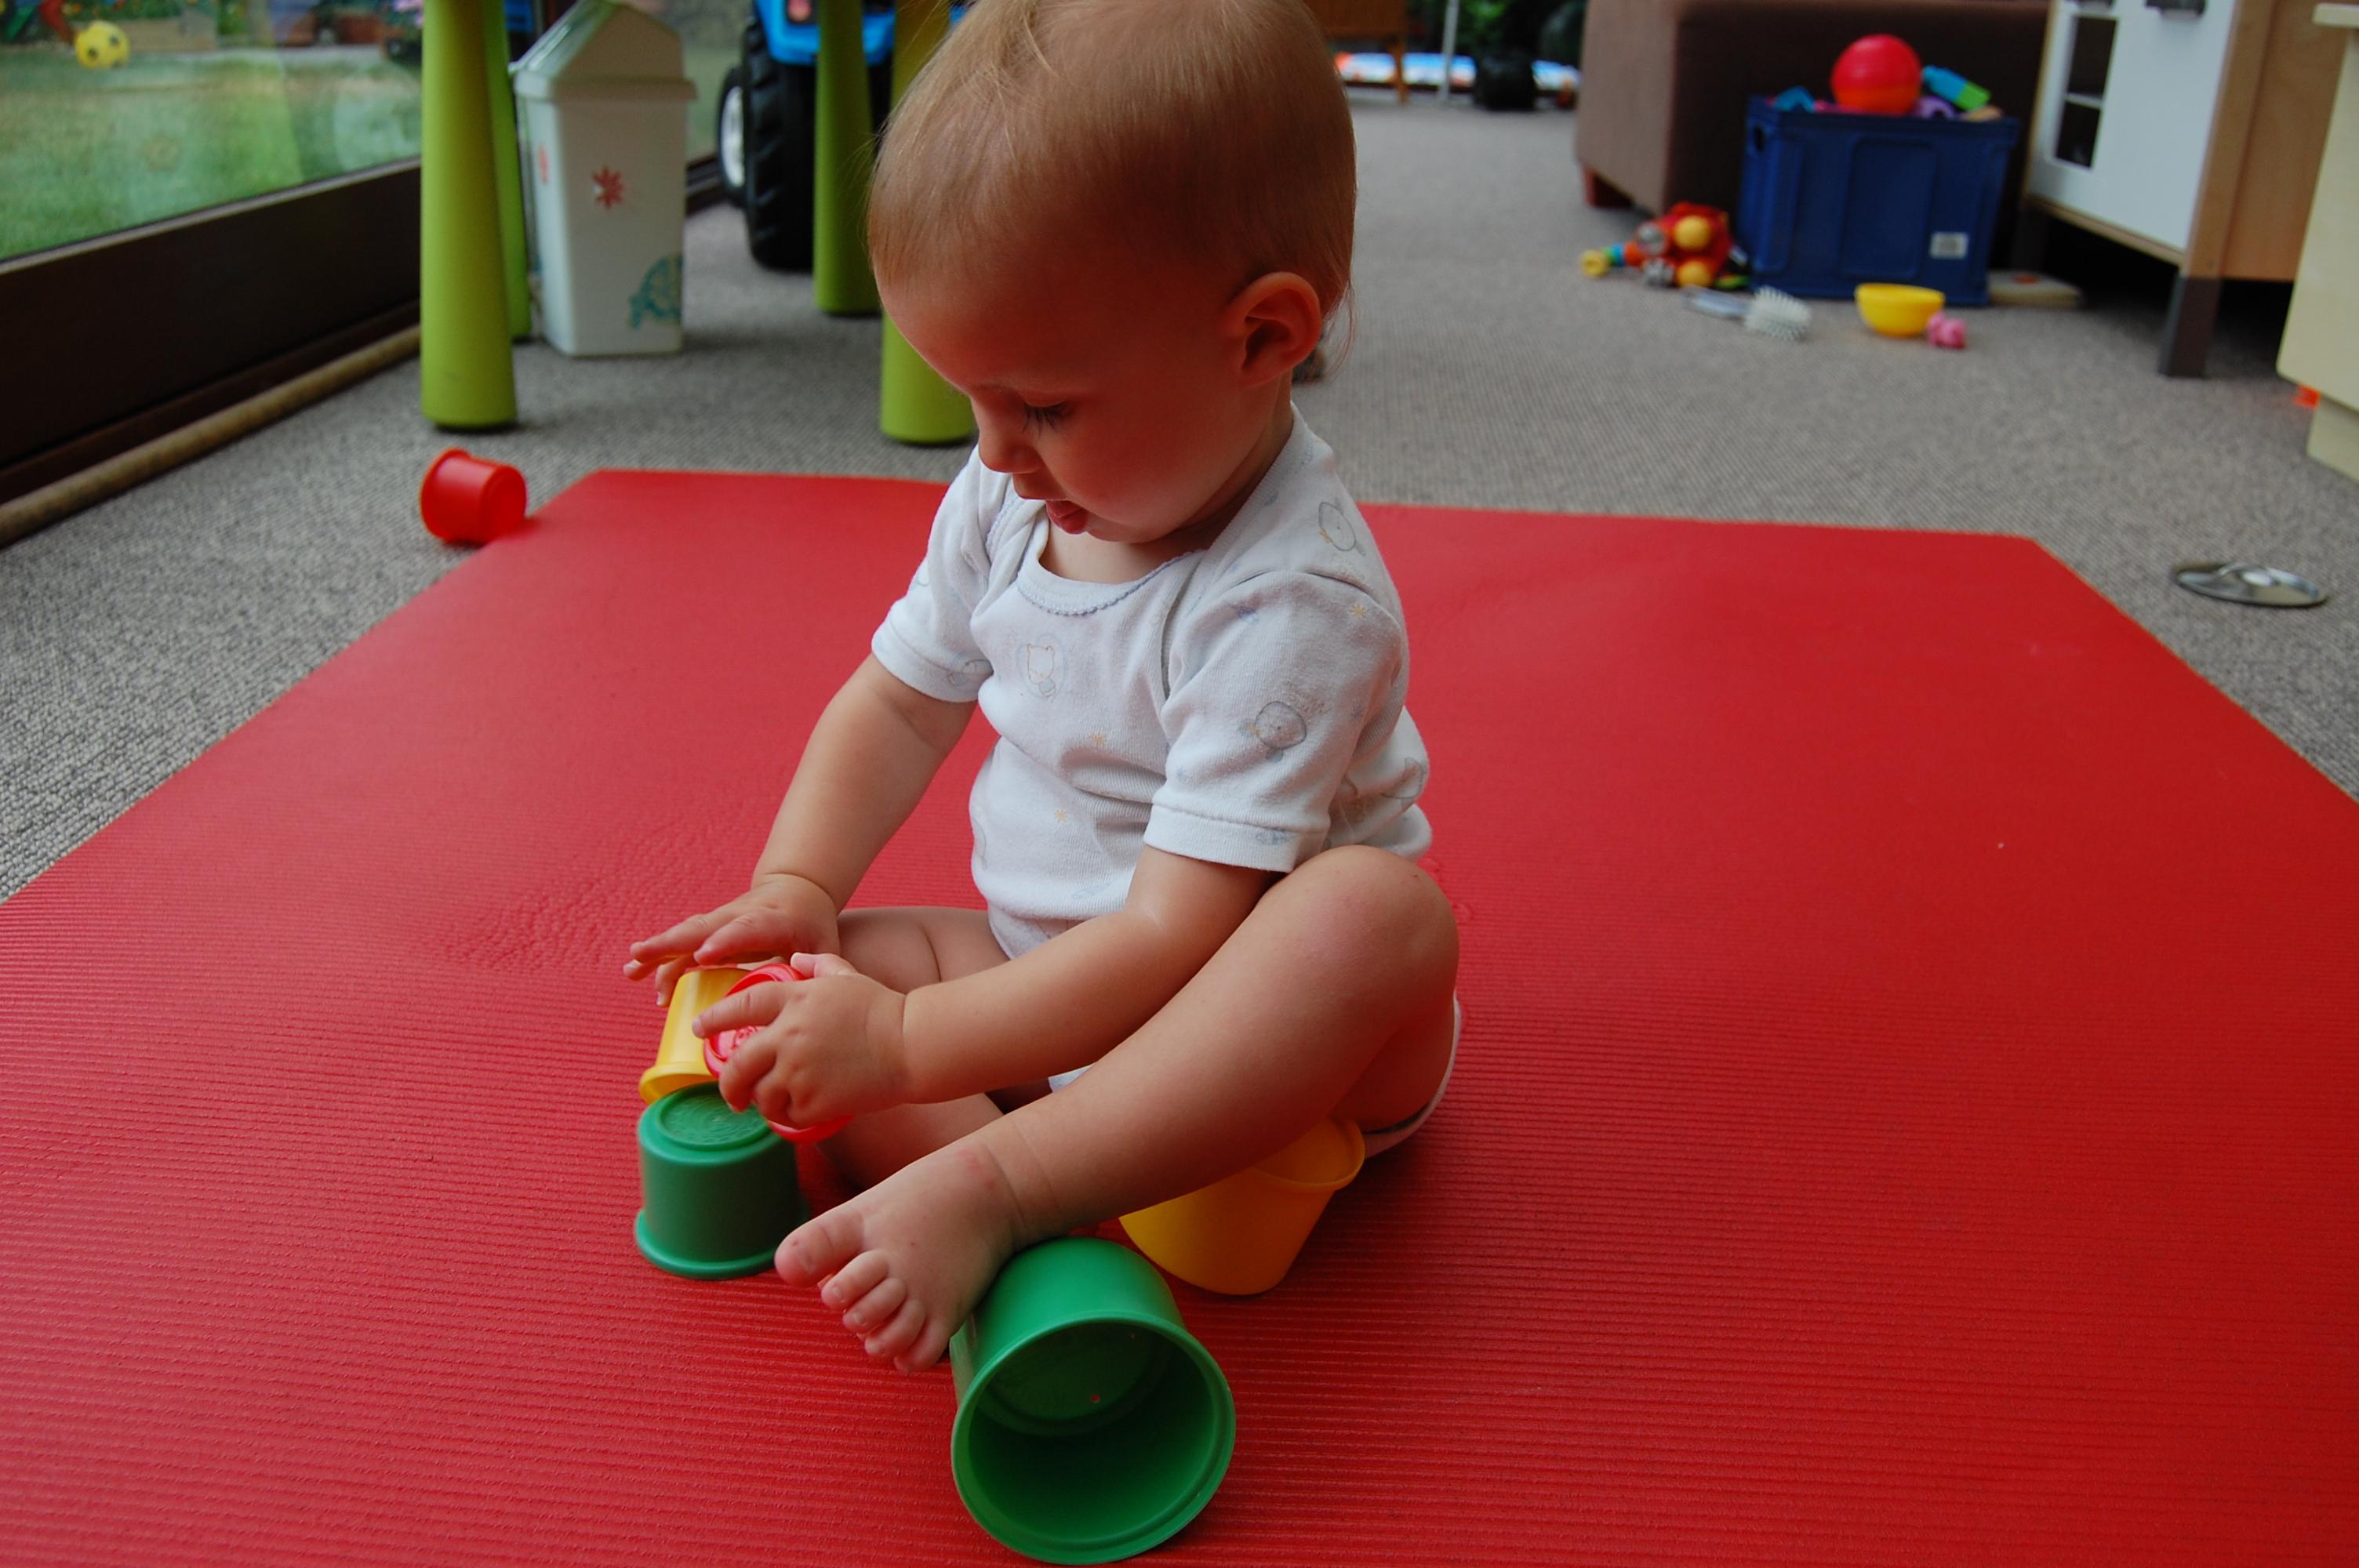 kinesitherapie kinderen stimuleren motorische ontwikkeling achterstand